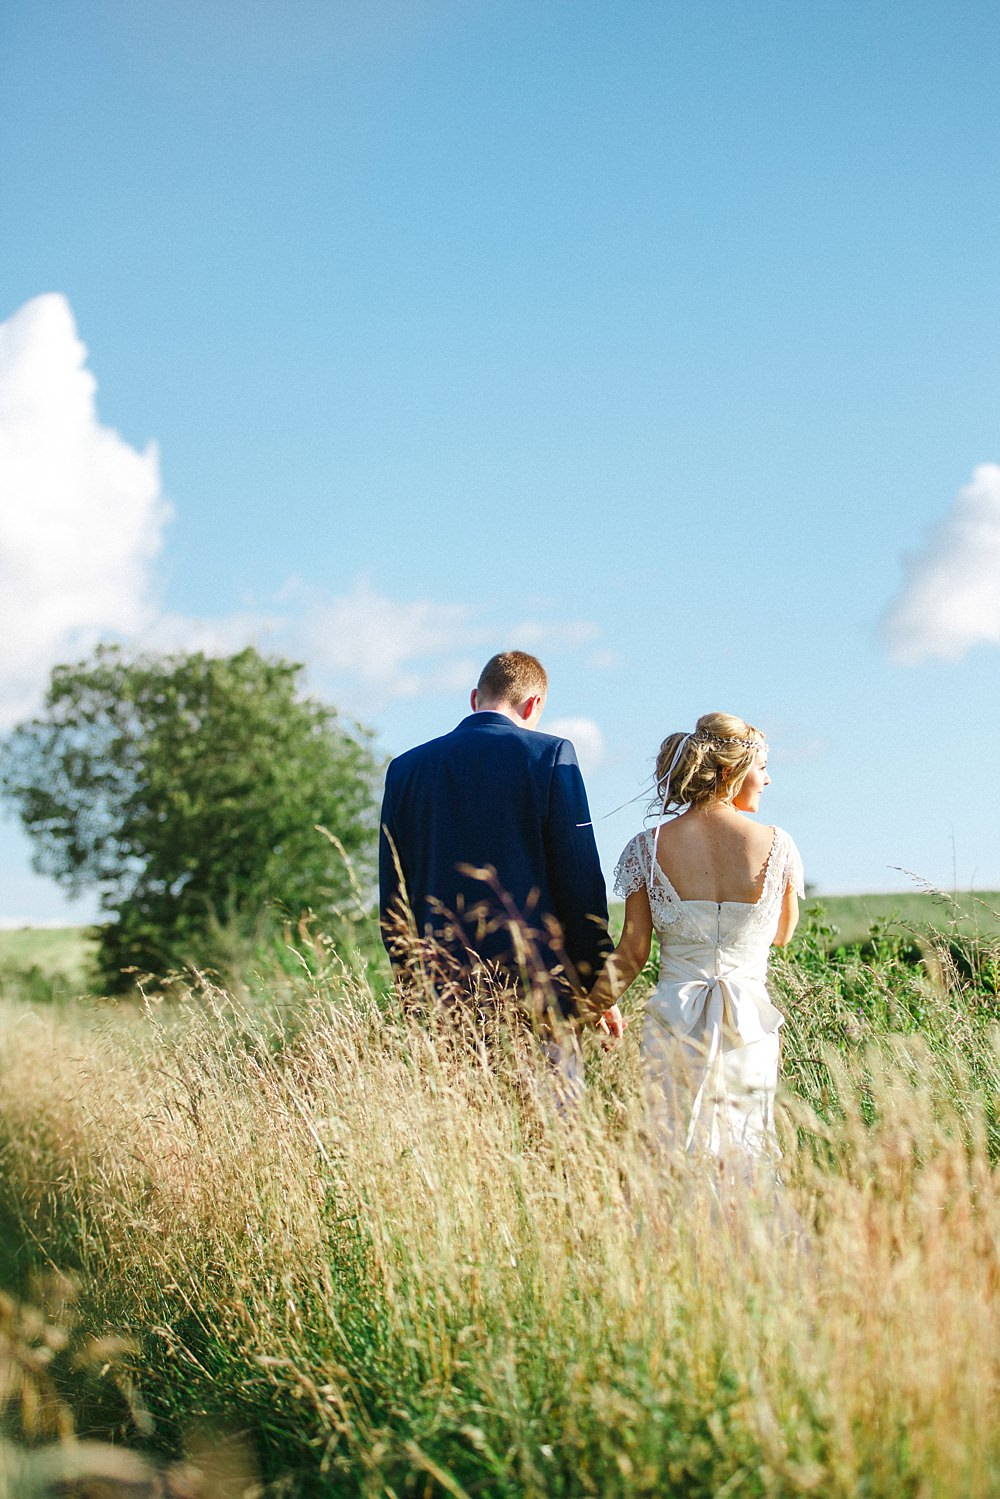 Chantal Lachance-Gibson Photography,Fine Art Wedding Photographers,The Gibsons,creative wedding photographers glasgow,husband and wife wedding photographers scotland,natural wedding photographers Glasgow,